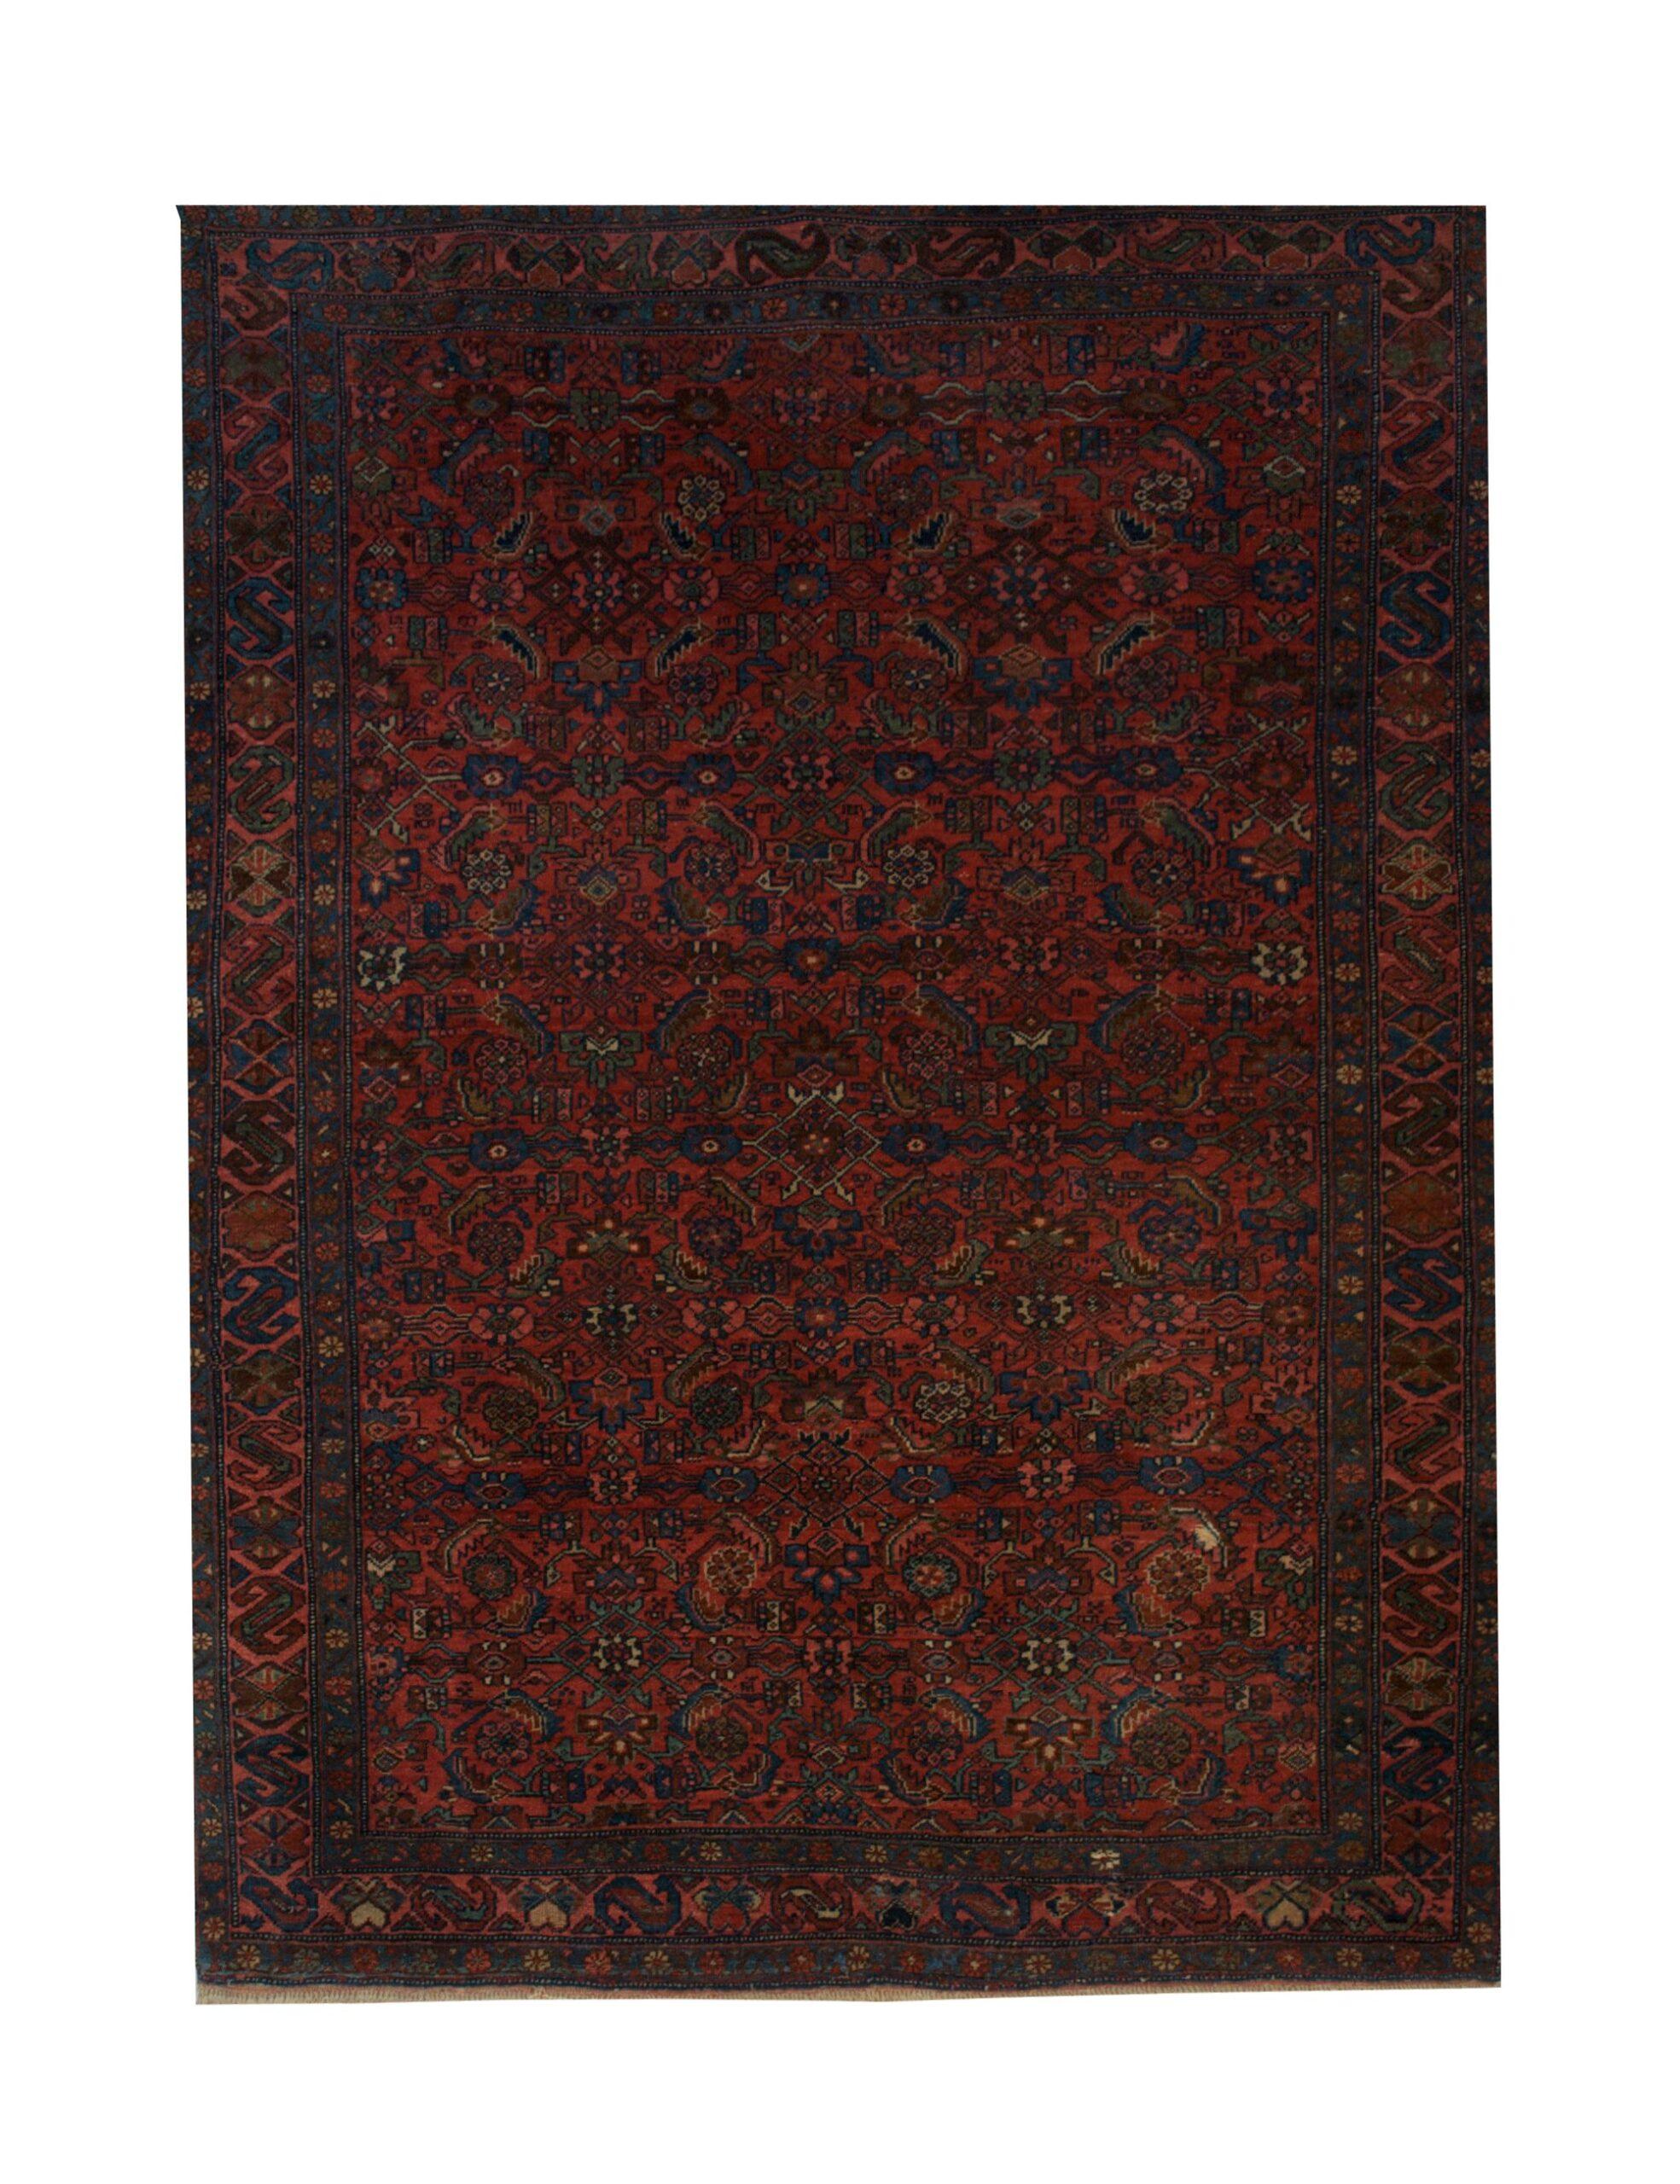 "Antique Persian Bijar 4' 9"" x 6' 6"" - Shabahang Royal Carpet"